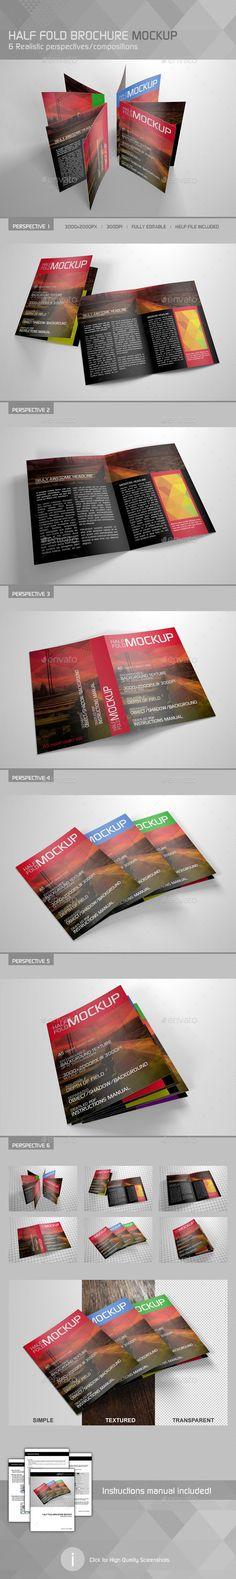 716 best Brochure Mockup Template images on Pinterest - half fold brochure template